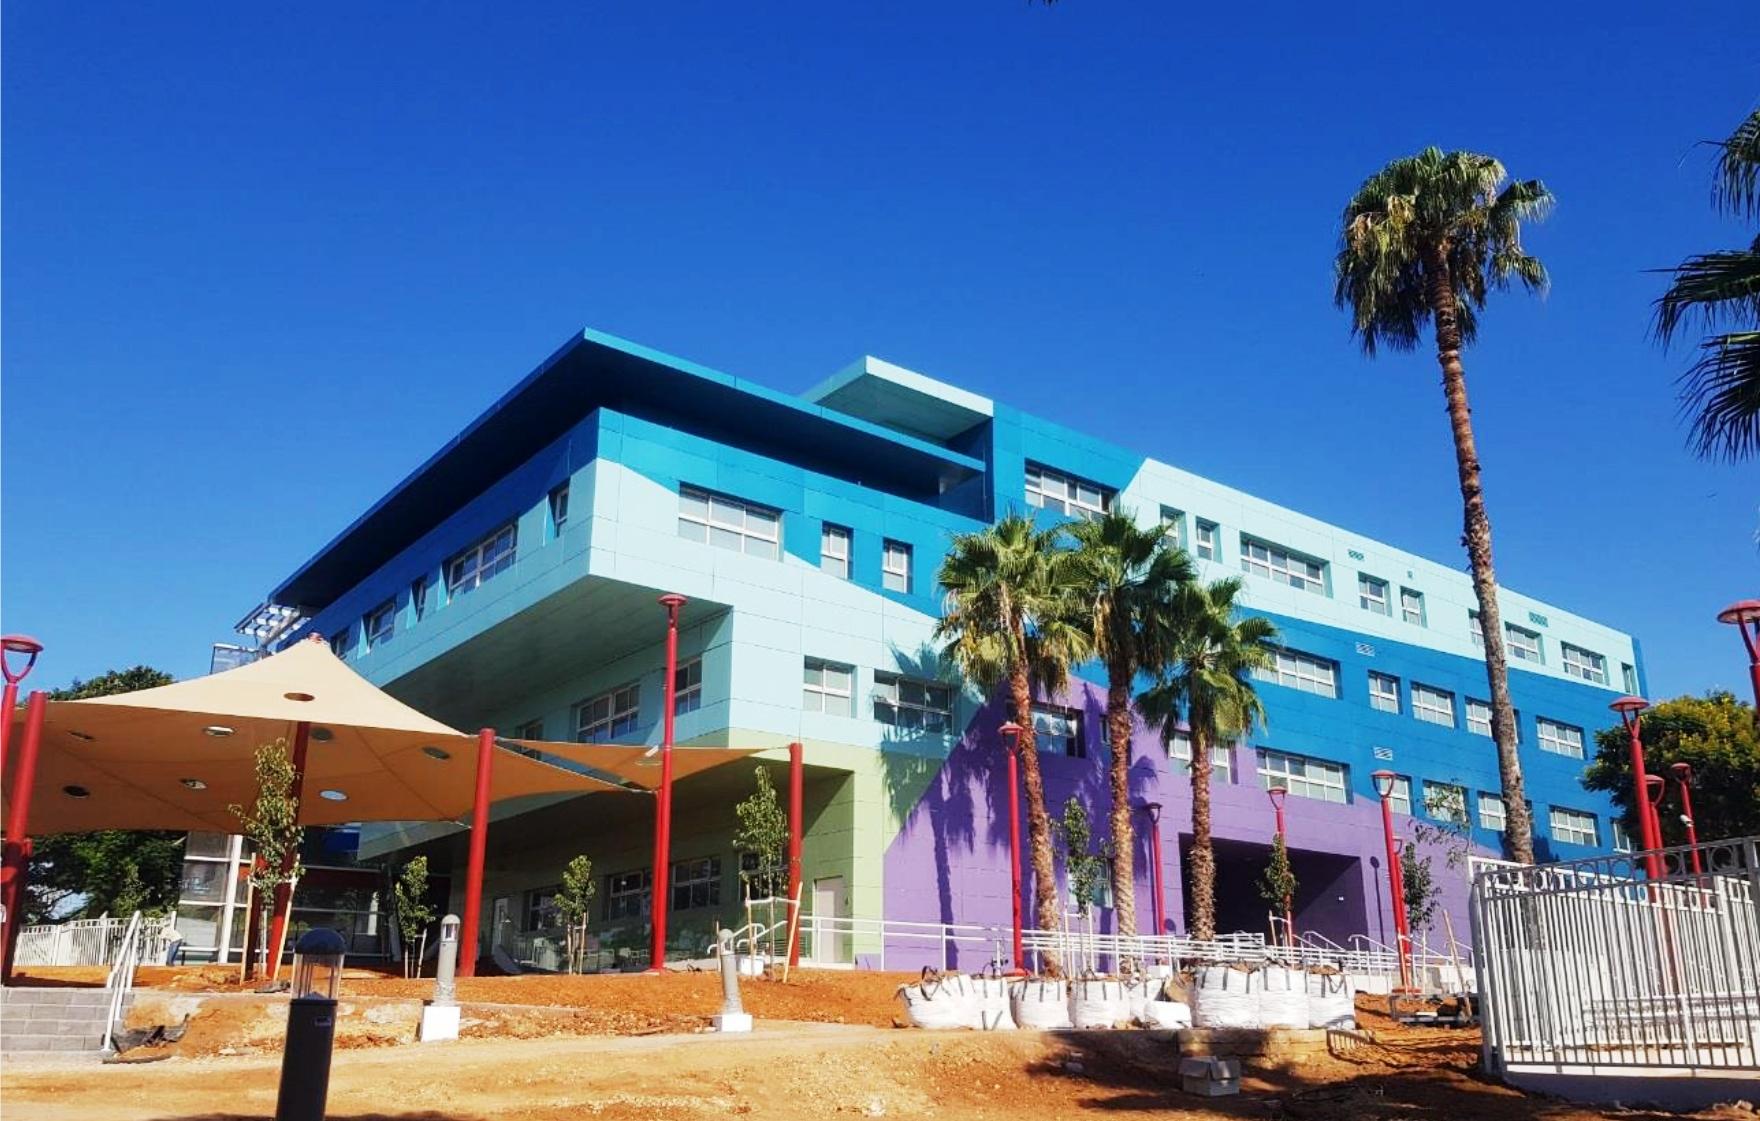 Photo of מבנים ומתקני ציבור חדשים לקראת שנת הלימודים בראשון לציון